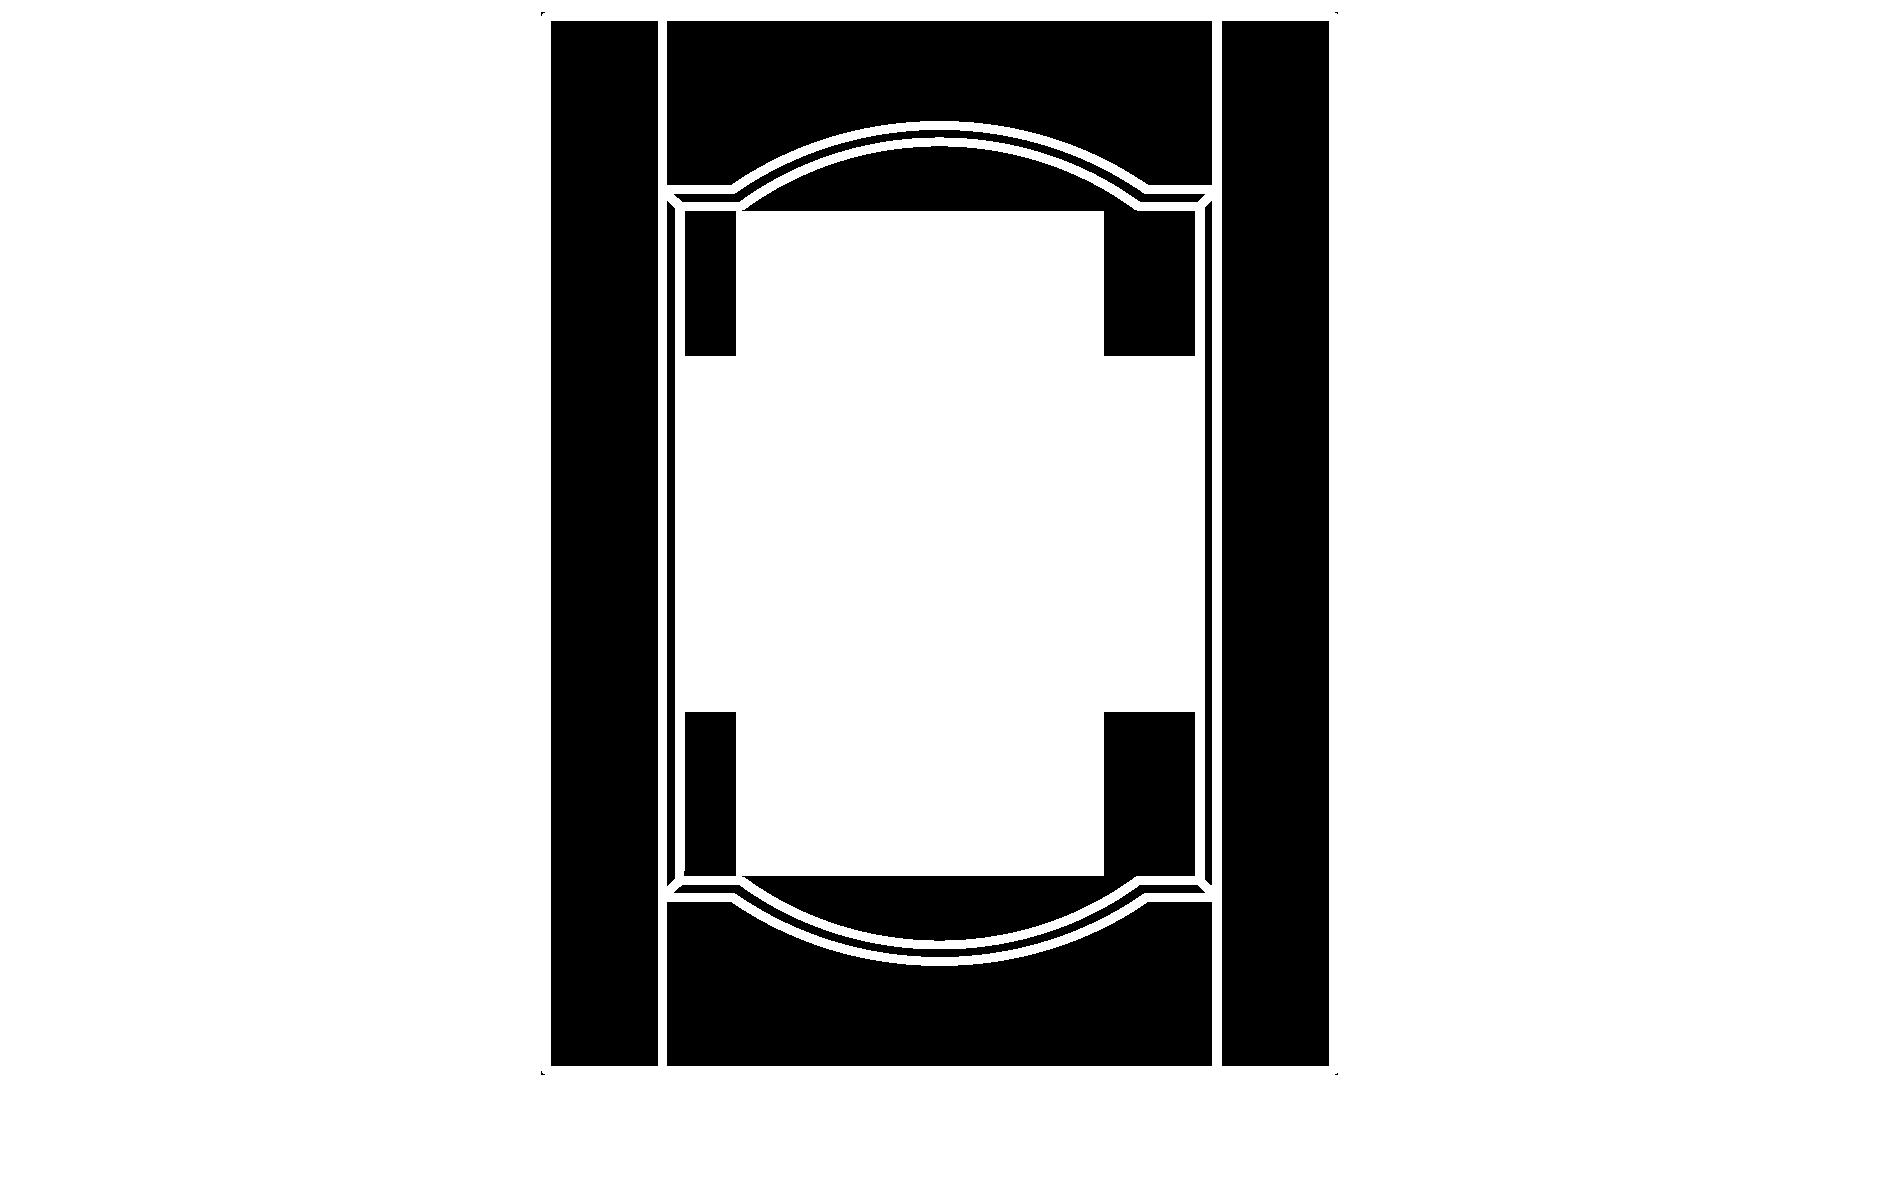 C123 cope and stick cabinet door configuration